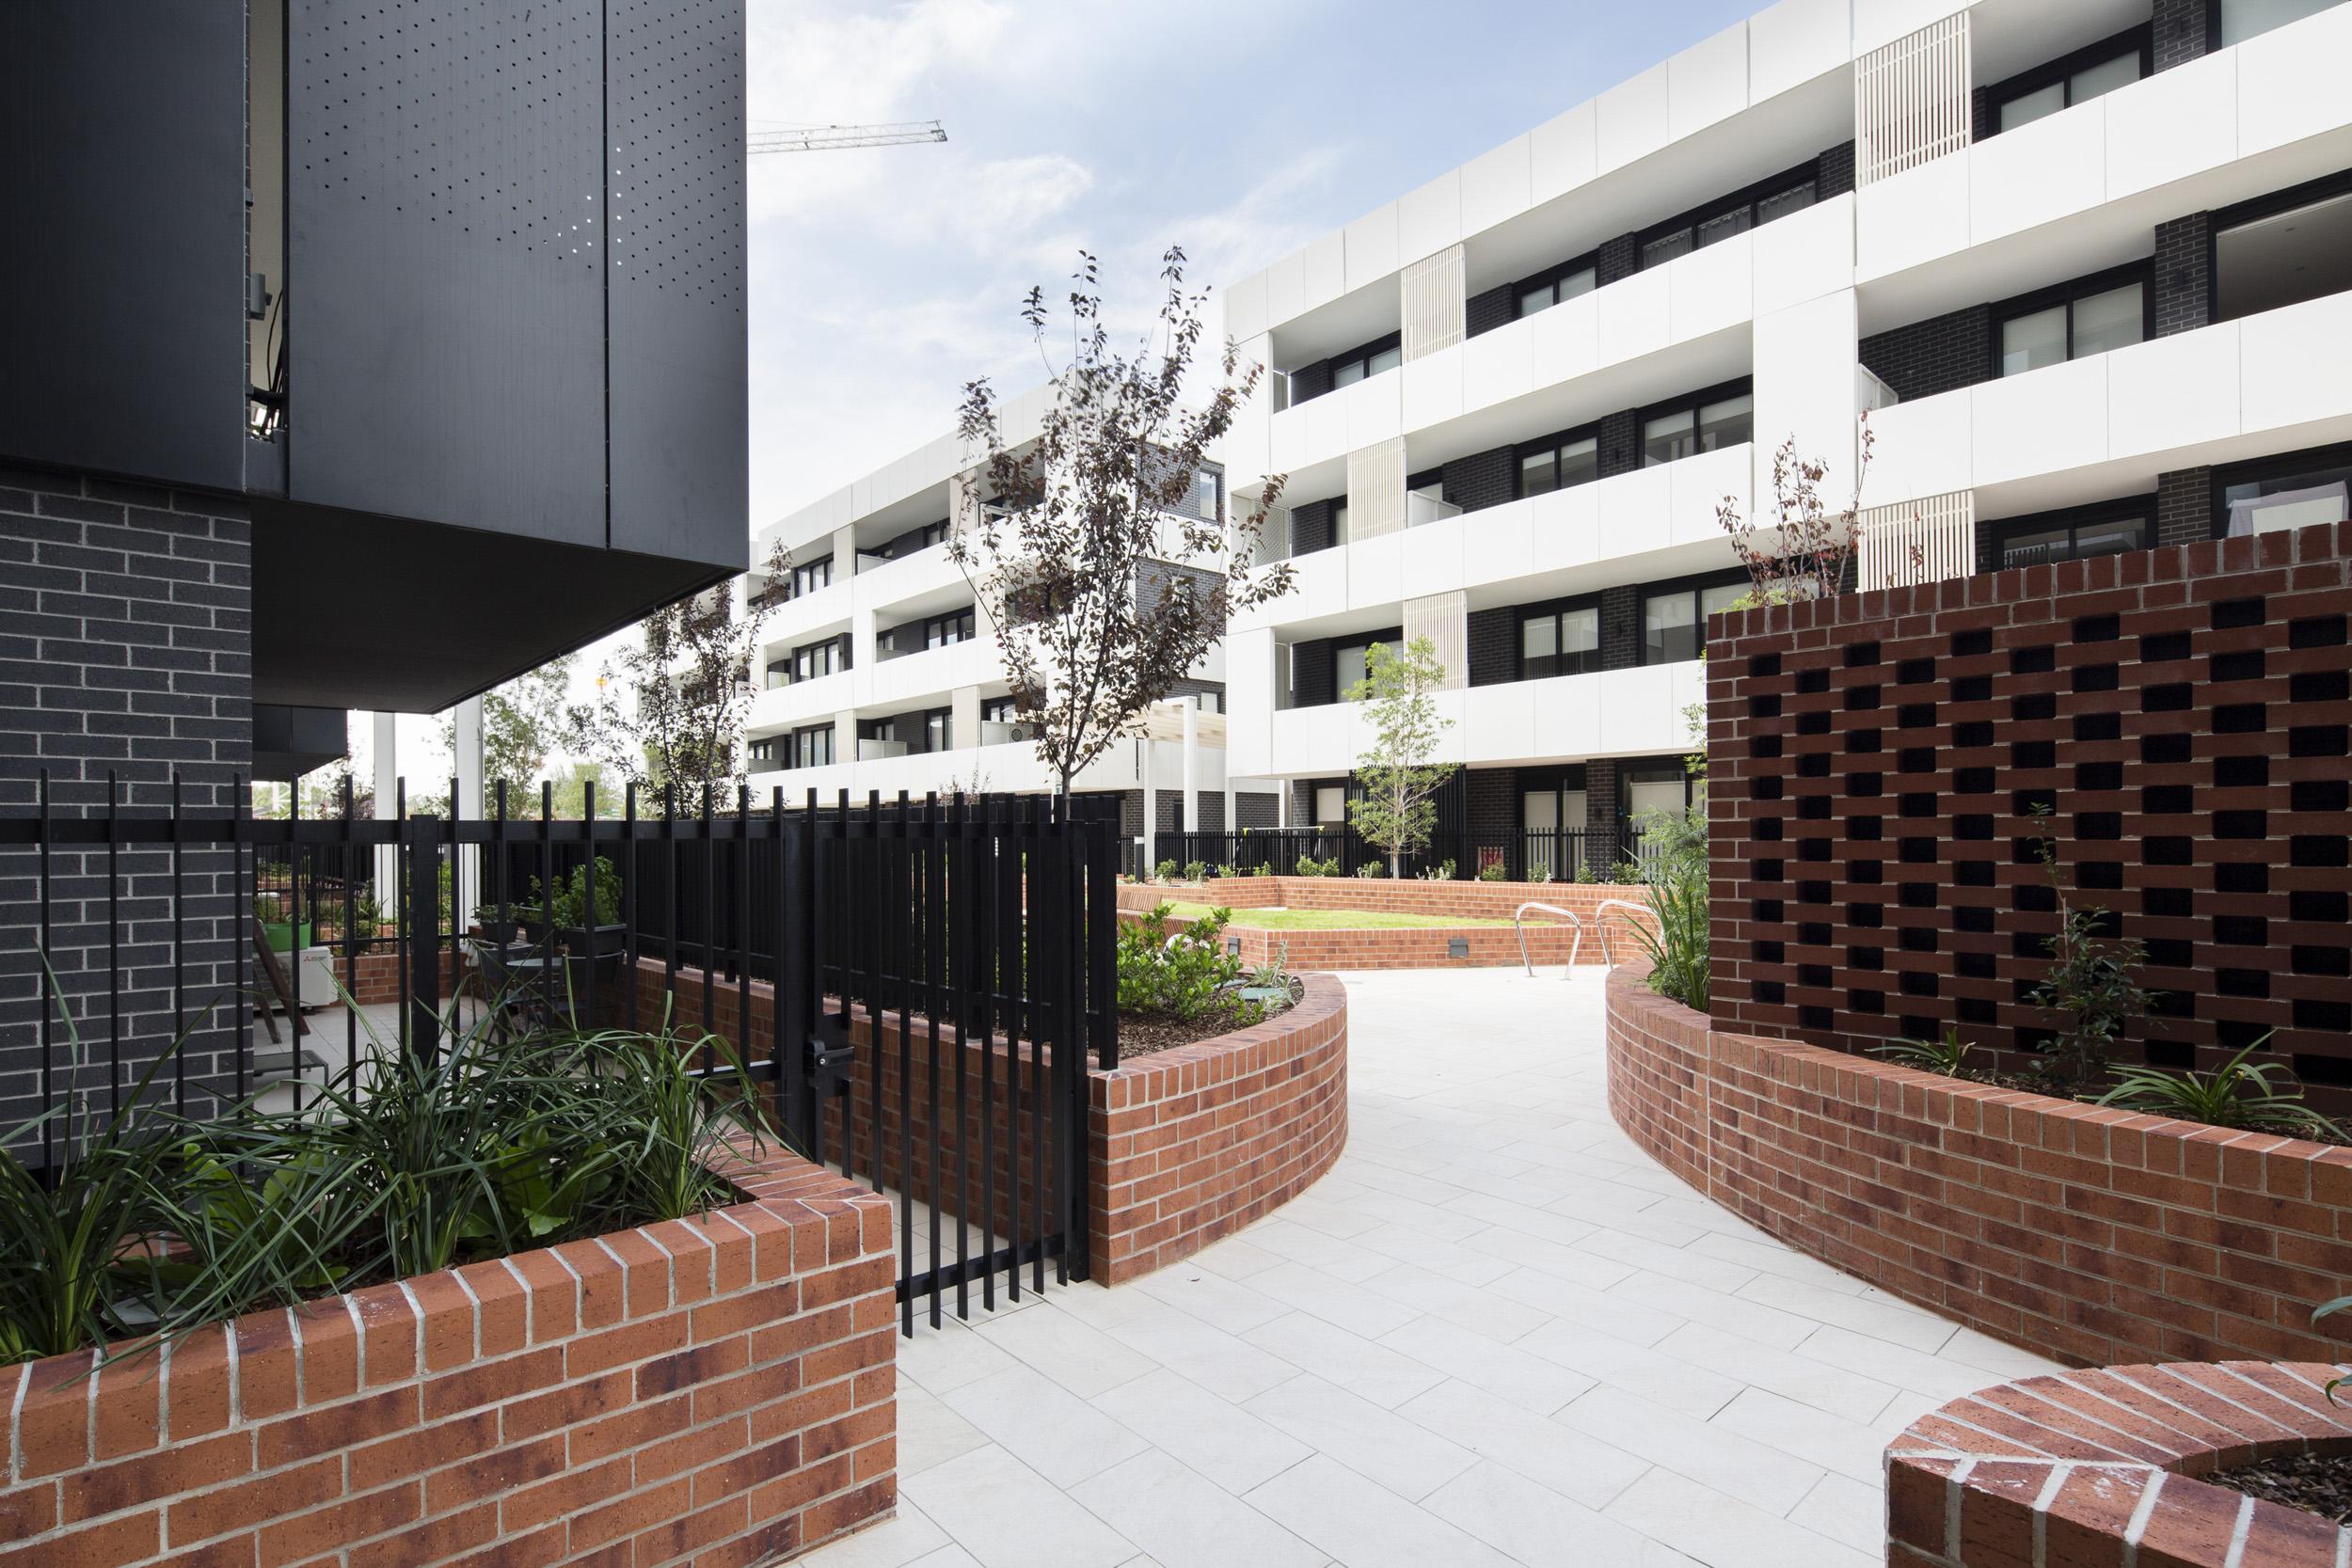 architecture_photography_sydney_australia_35.jpg